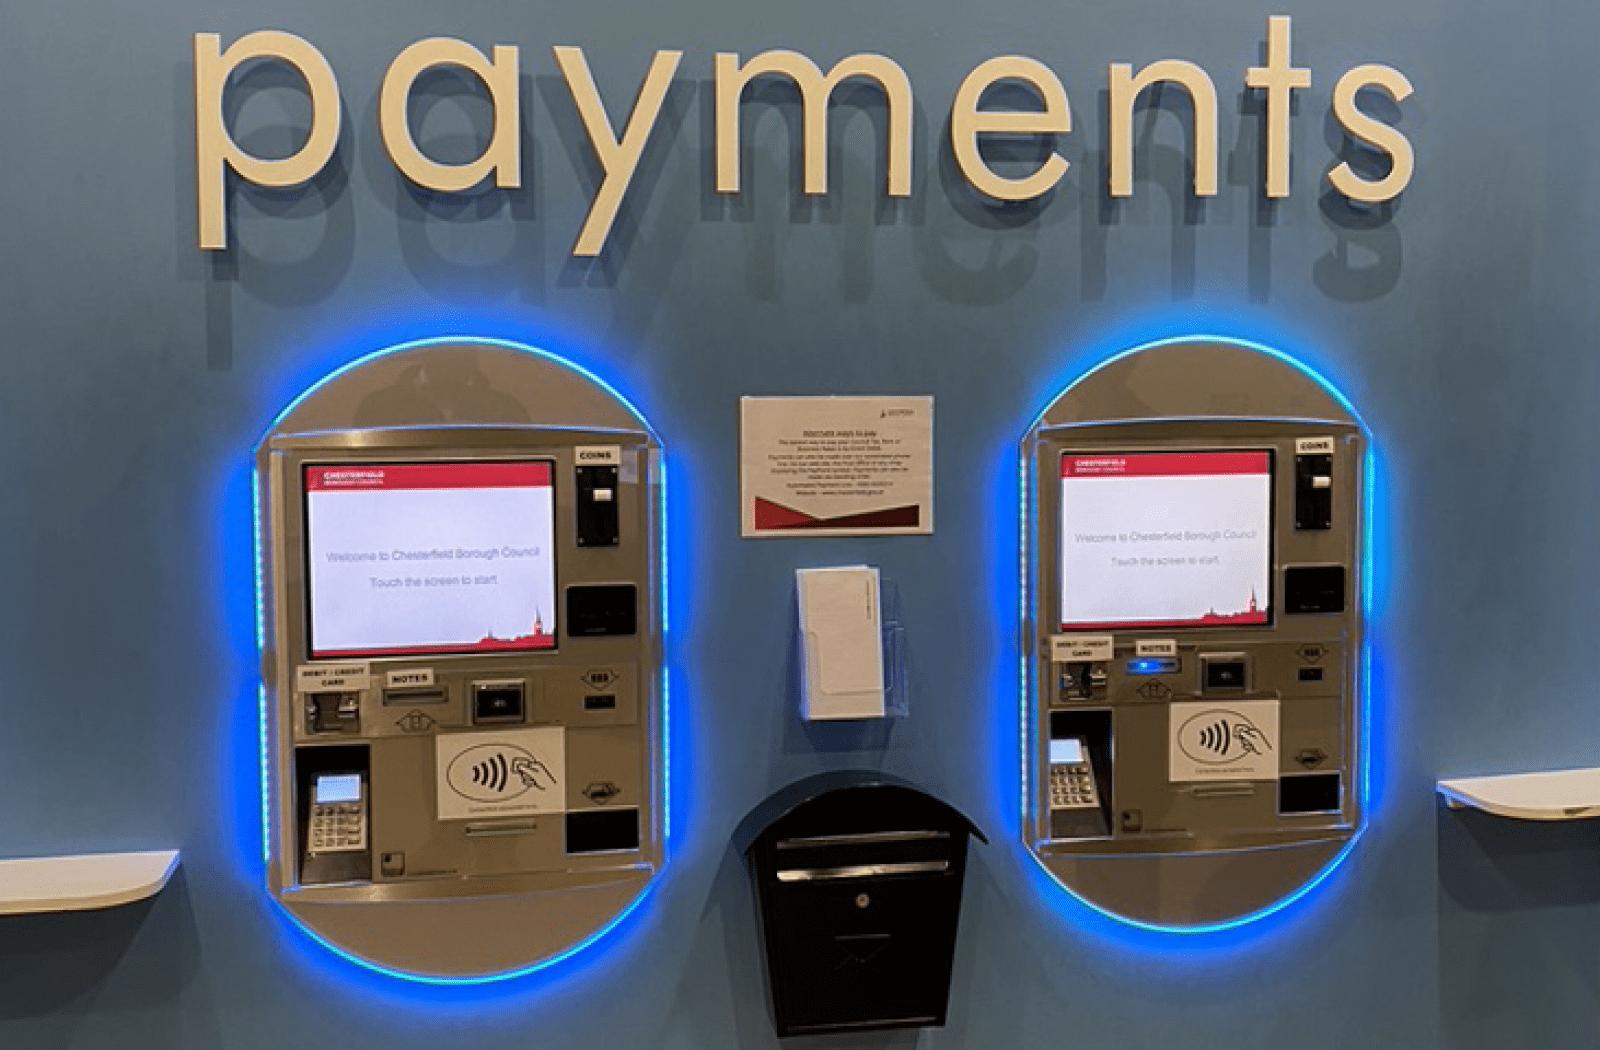 Chesterfield Borough Council Payment Kiosks